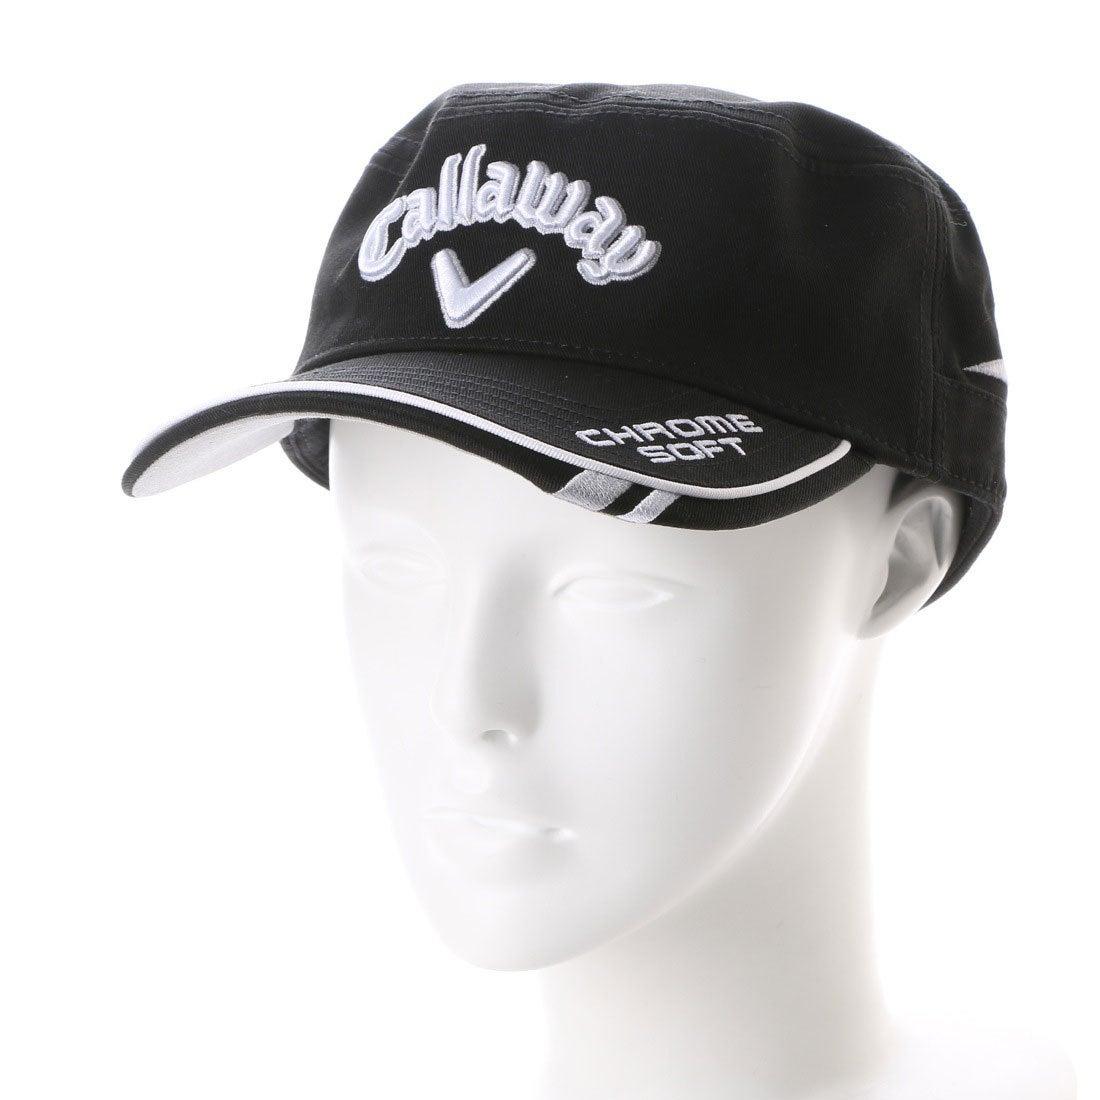 【SALE 20%OFF】キャロウェイ Callaway メンズ ゴルフ ワークキャップ Callaway Tour Work Cap 16 JM 4885882759 メンズ